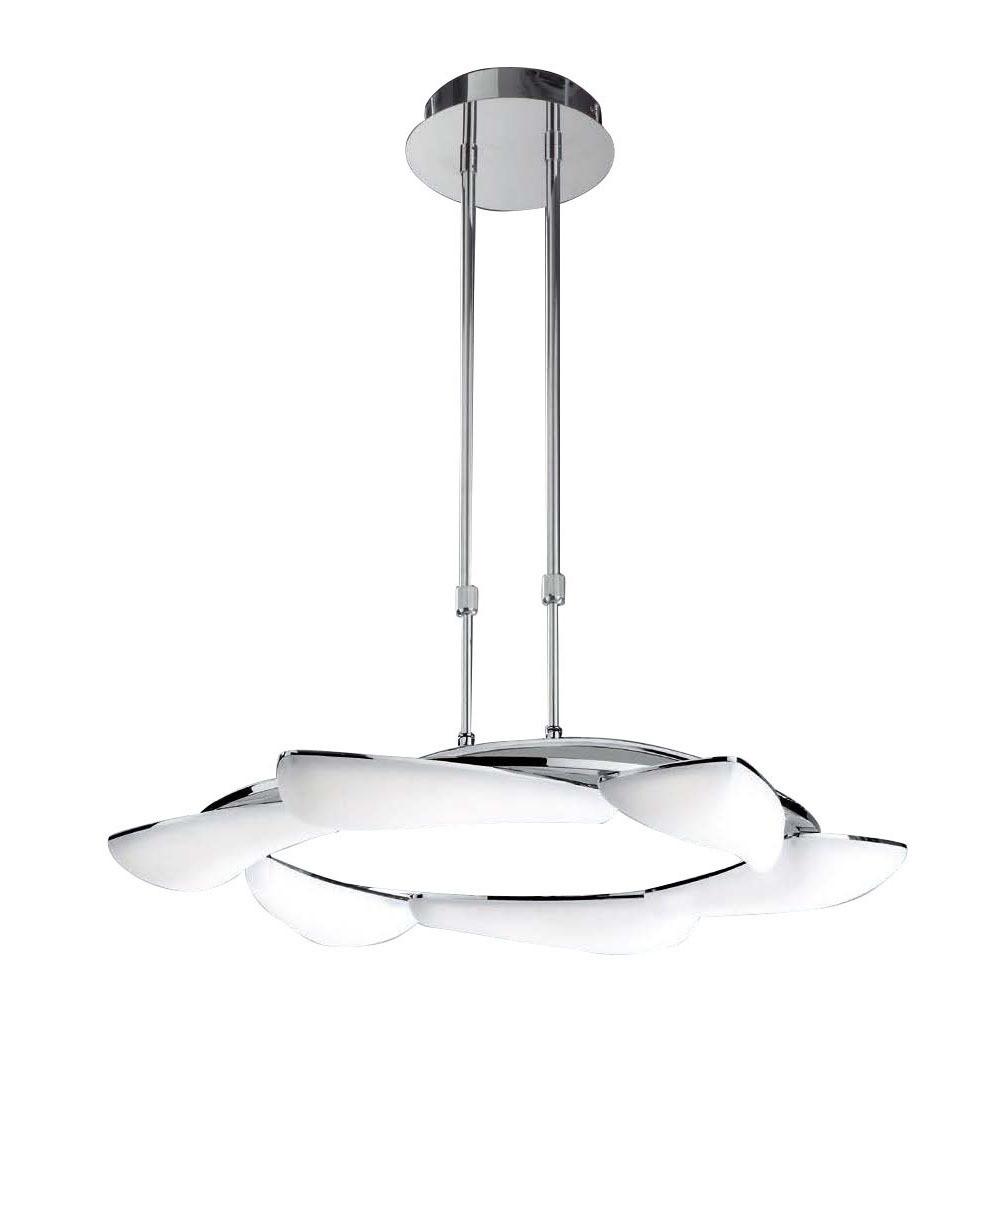 Mistral Telescopic 36W LED Round 3000K, 3240lm, Polished Chrome/Frosted Acrylic, 3yrs Warranty